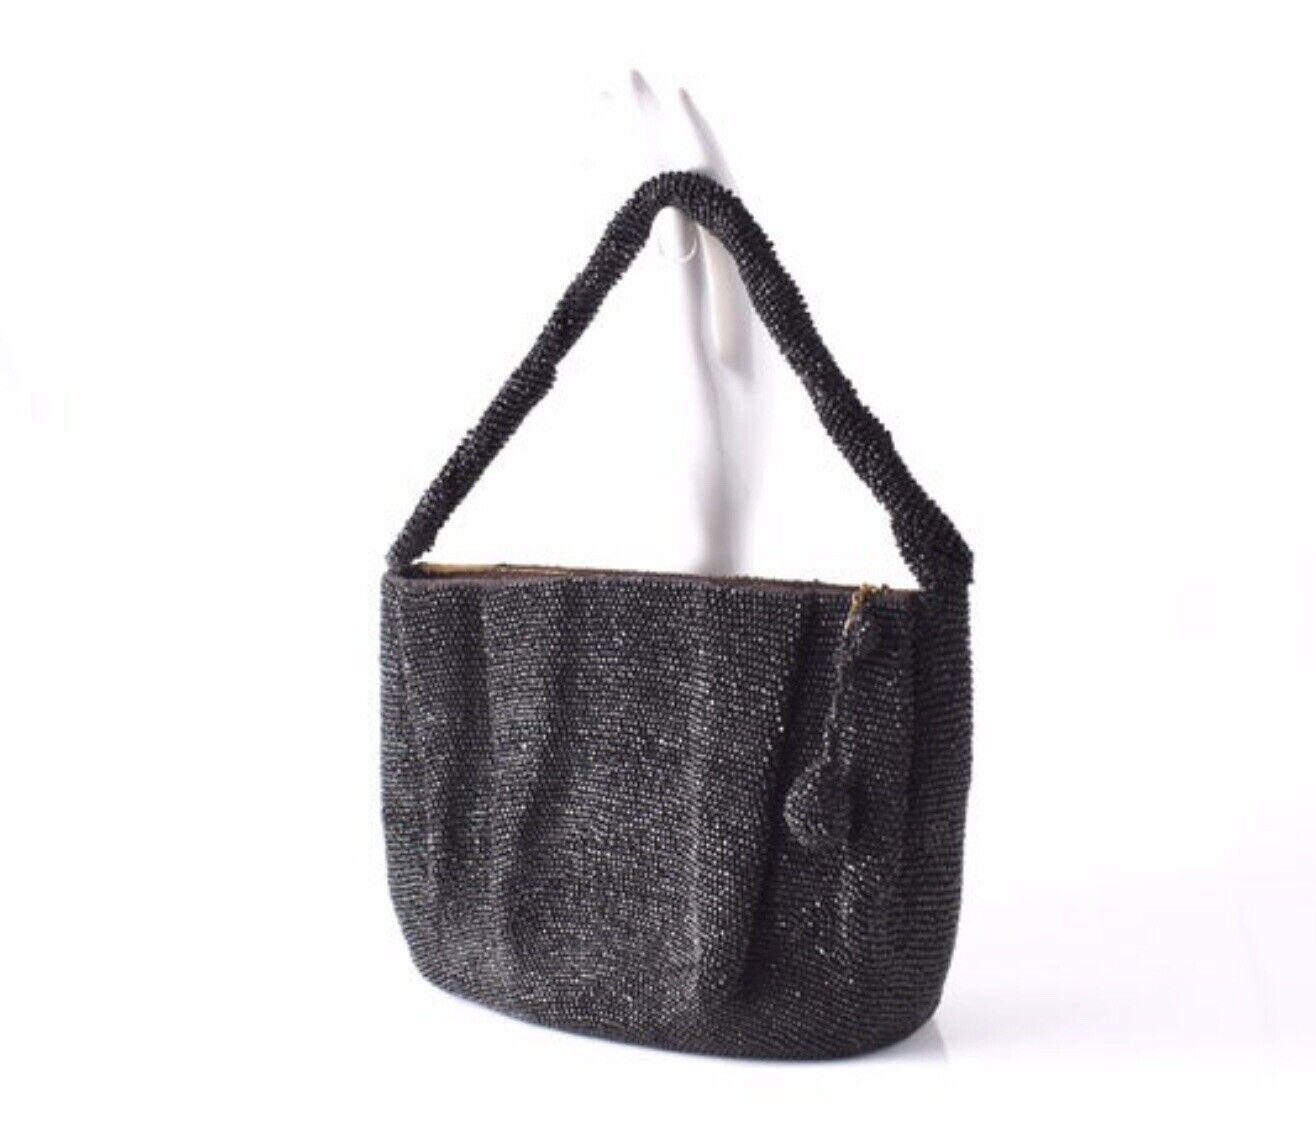 Art Deco 30s 40s Vintage Black Cut Glass Beads Ruched Beaded Handbag Purse bag